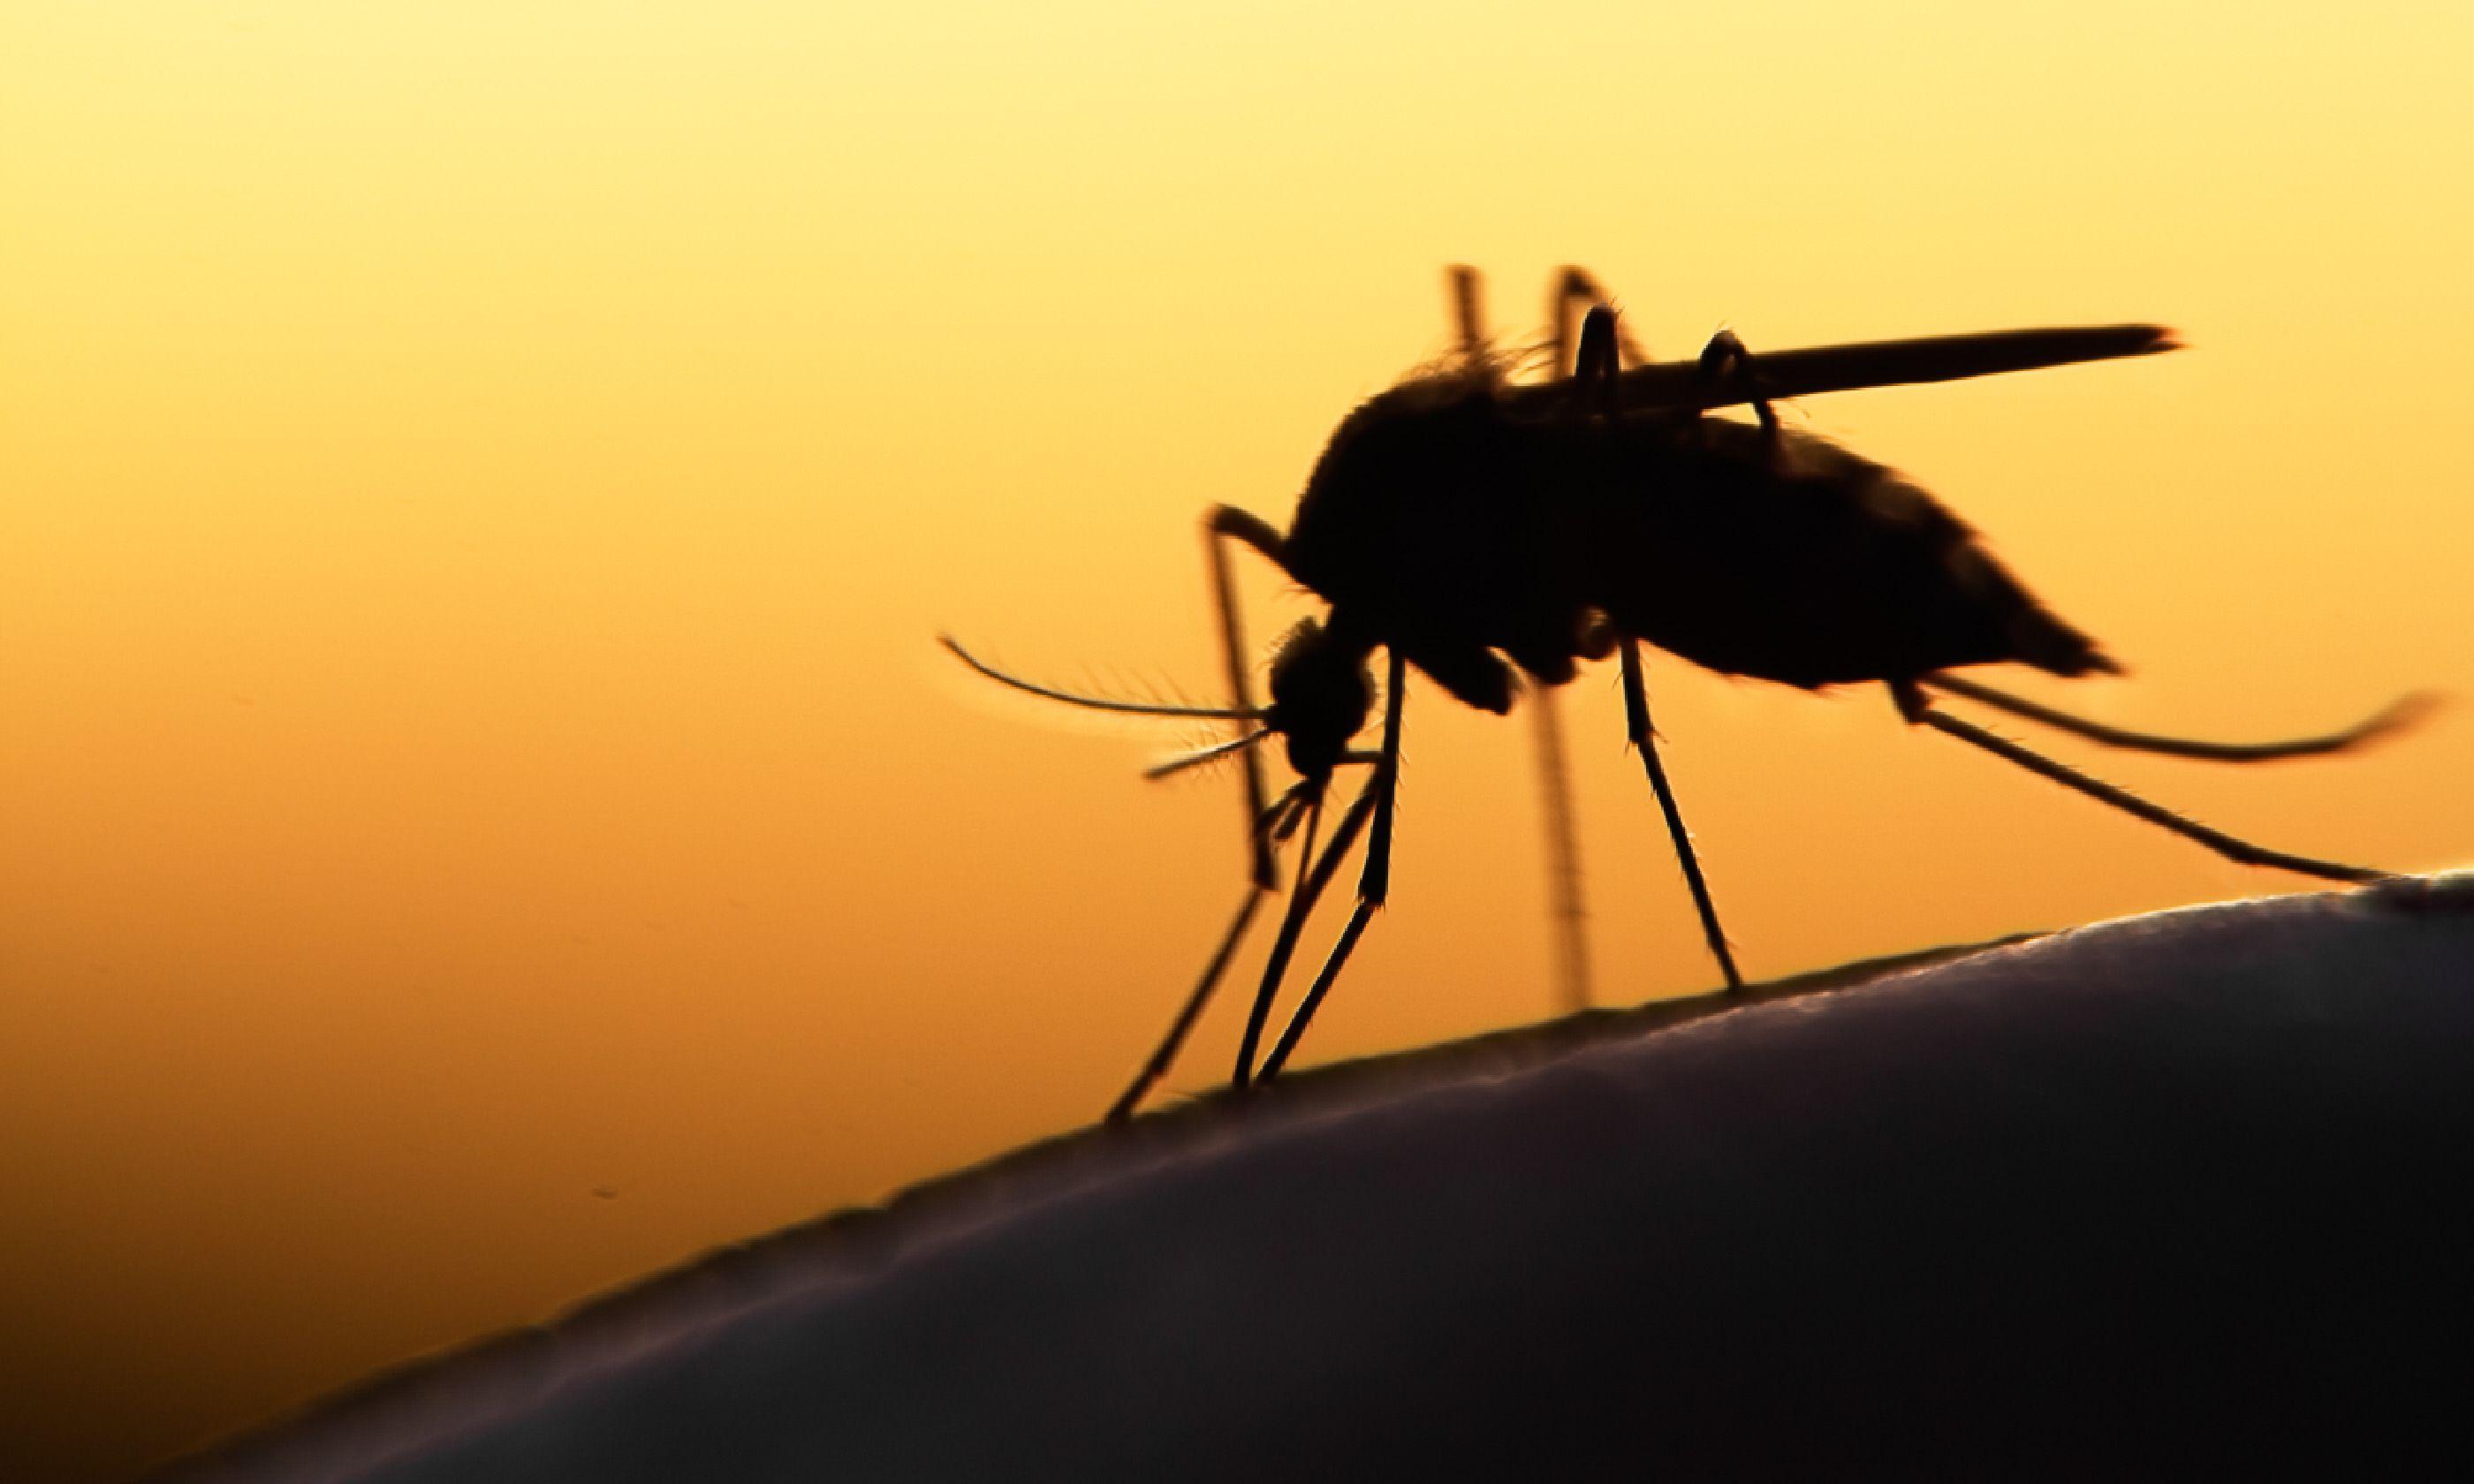 Mosquito on skin (Shutterstock)